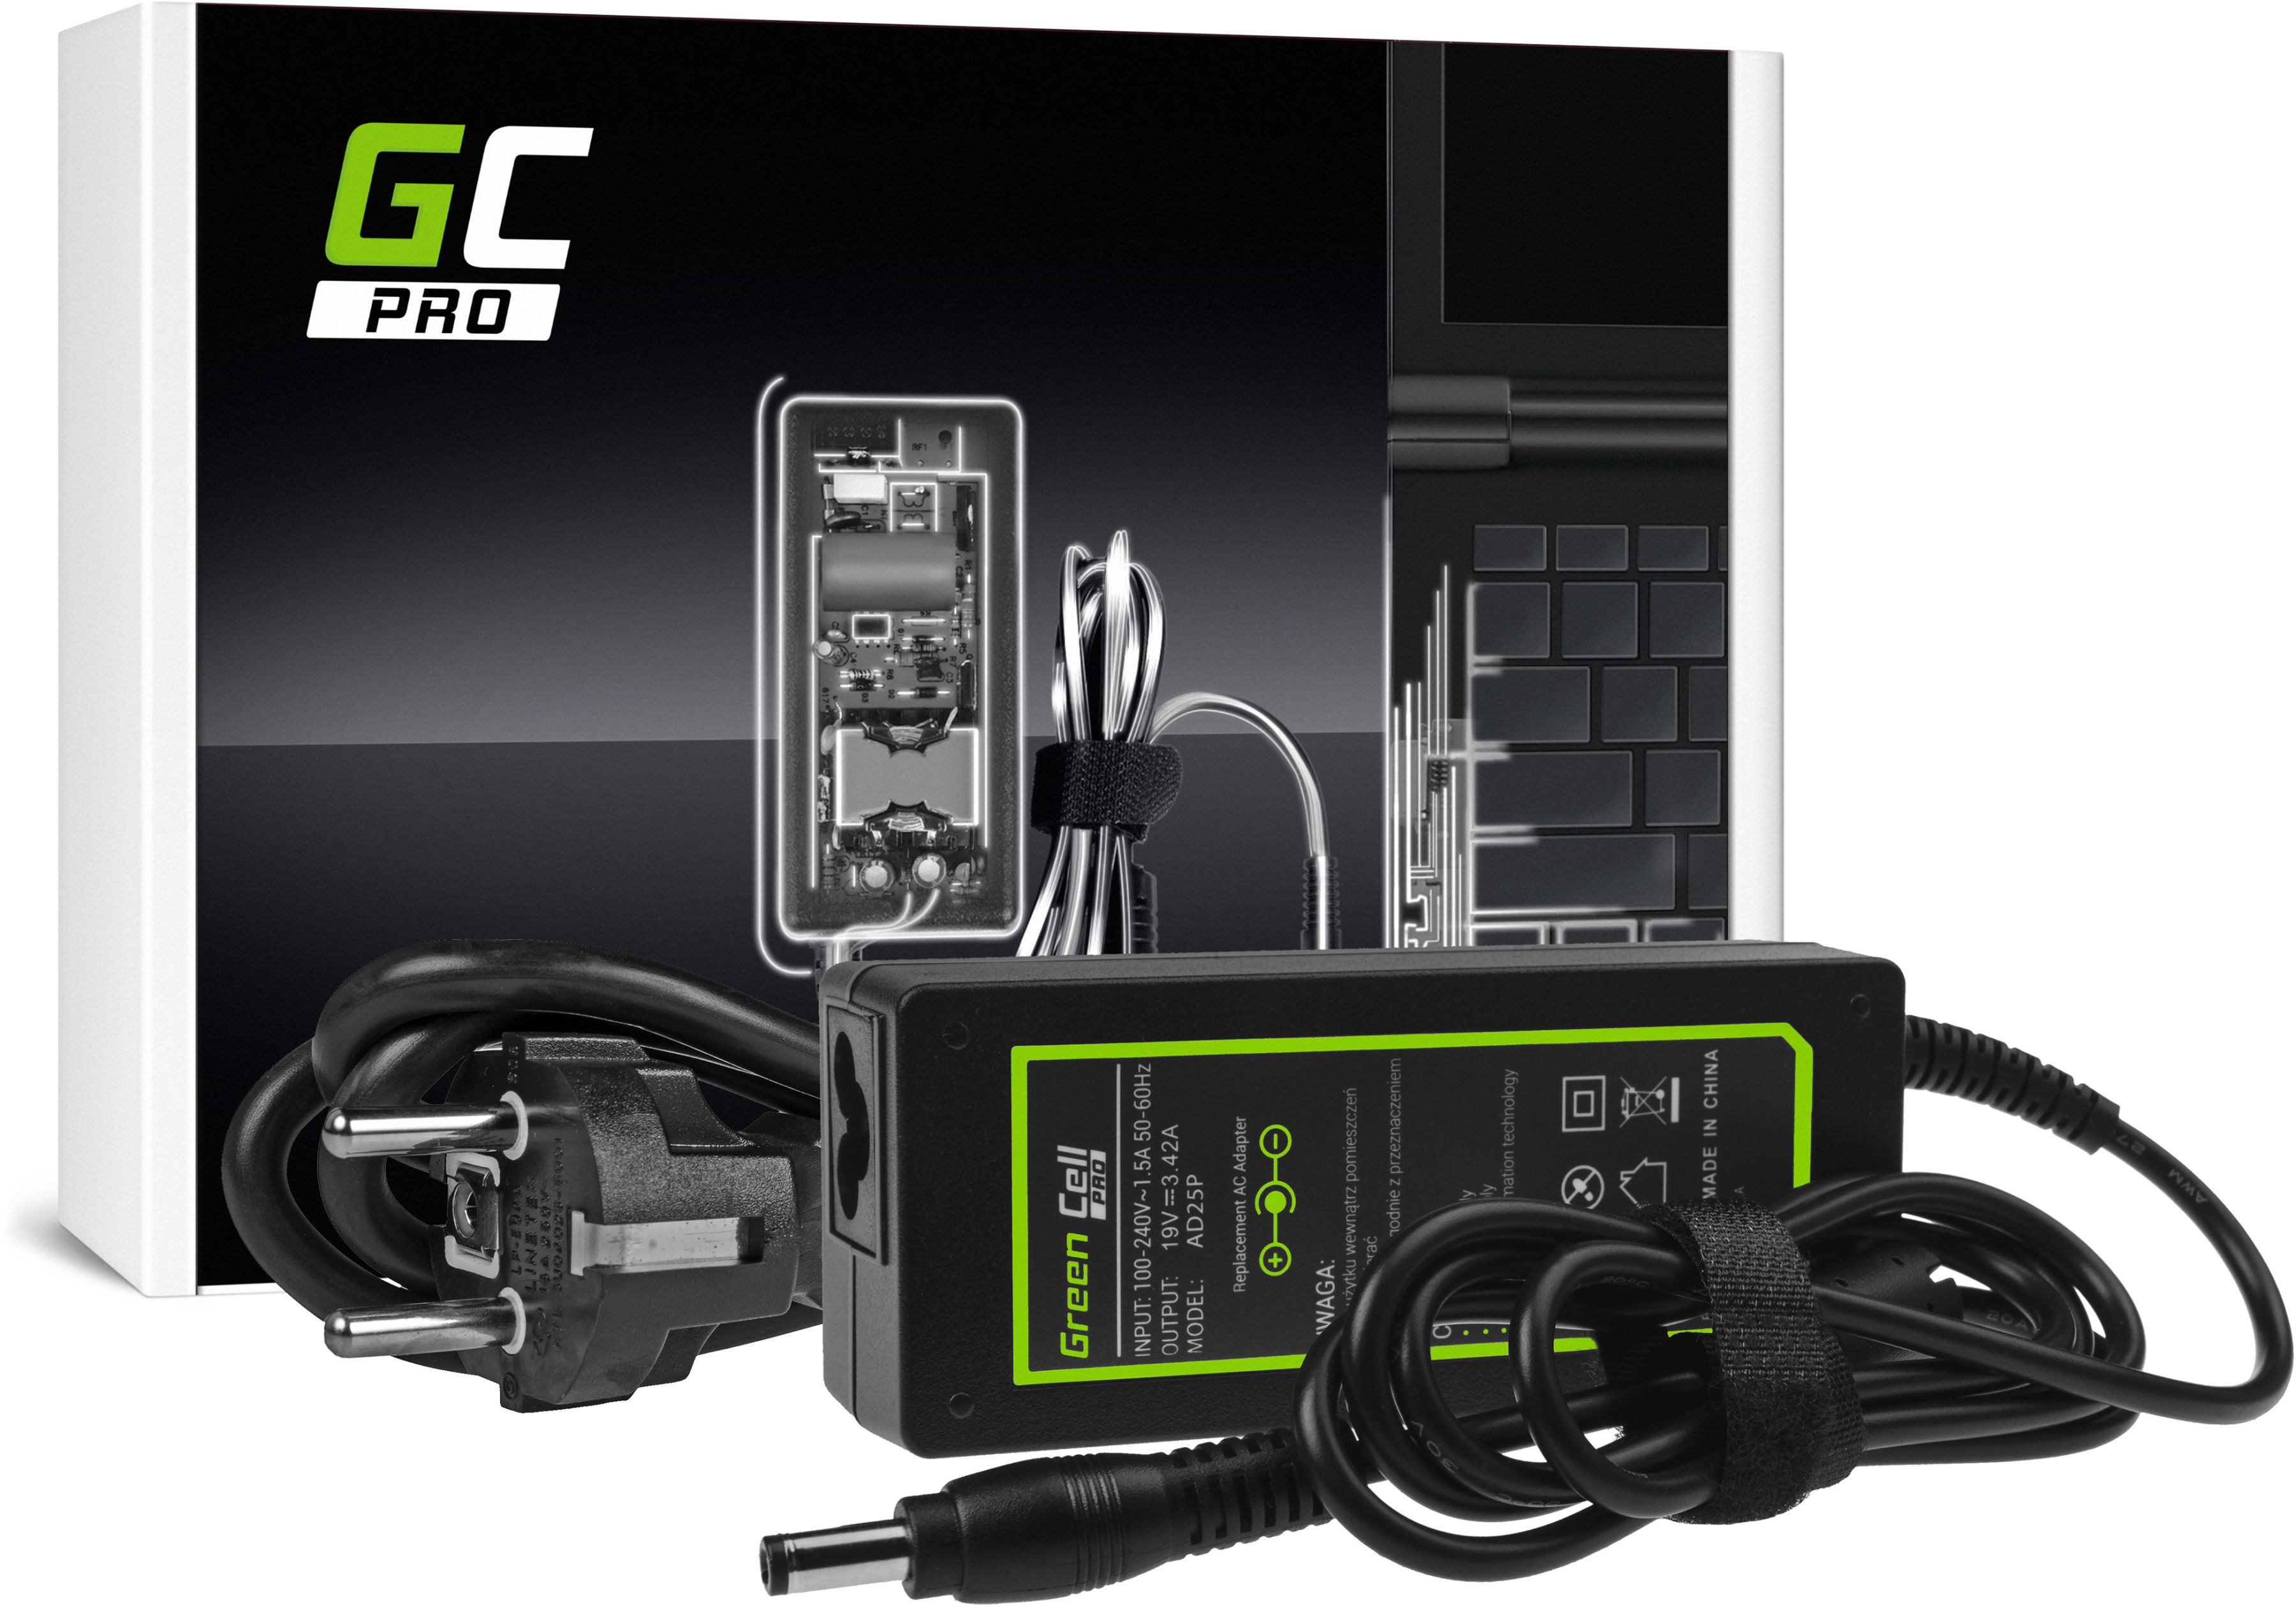 Zasilacz Ładowarka Green Cell PRO 19V 3.42A 65W do laptopa Asus R510C R510L R556L X550C X550L Toshiba Satellite C650 L750